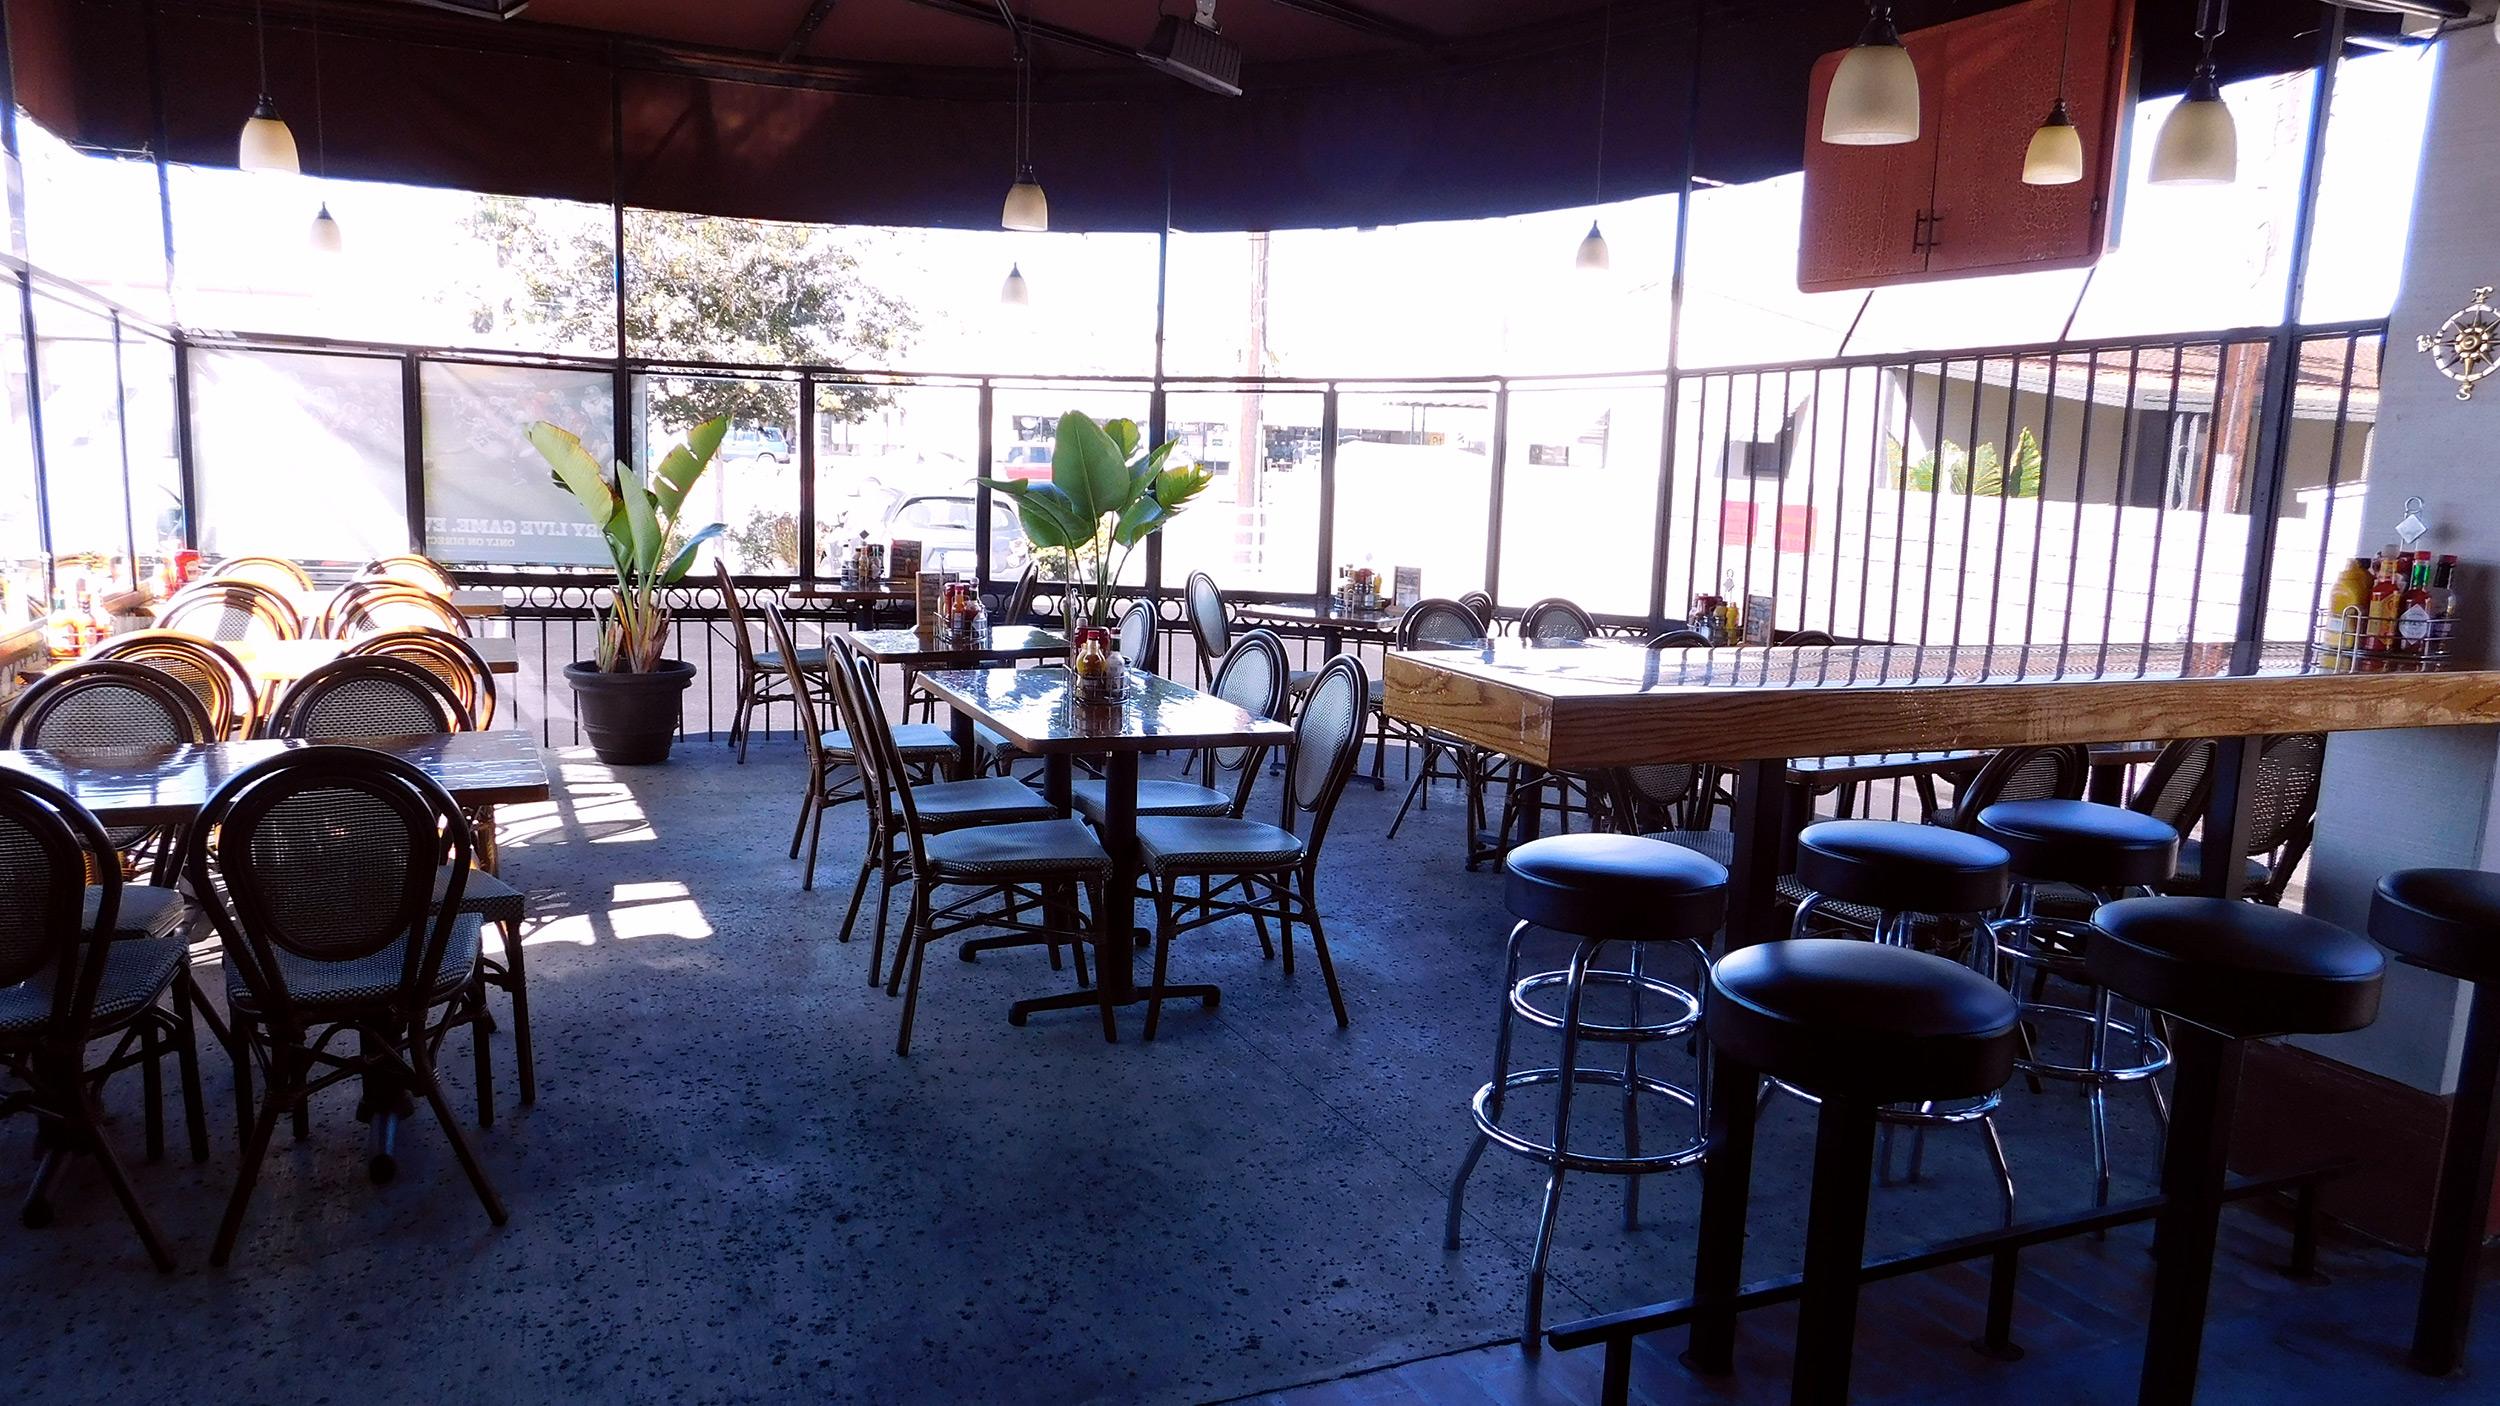 Breakfast-Brunch Restaurant in Huntington Beach